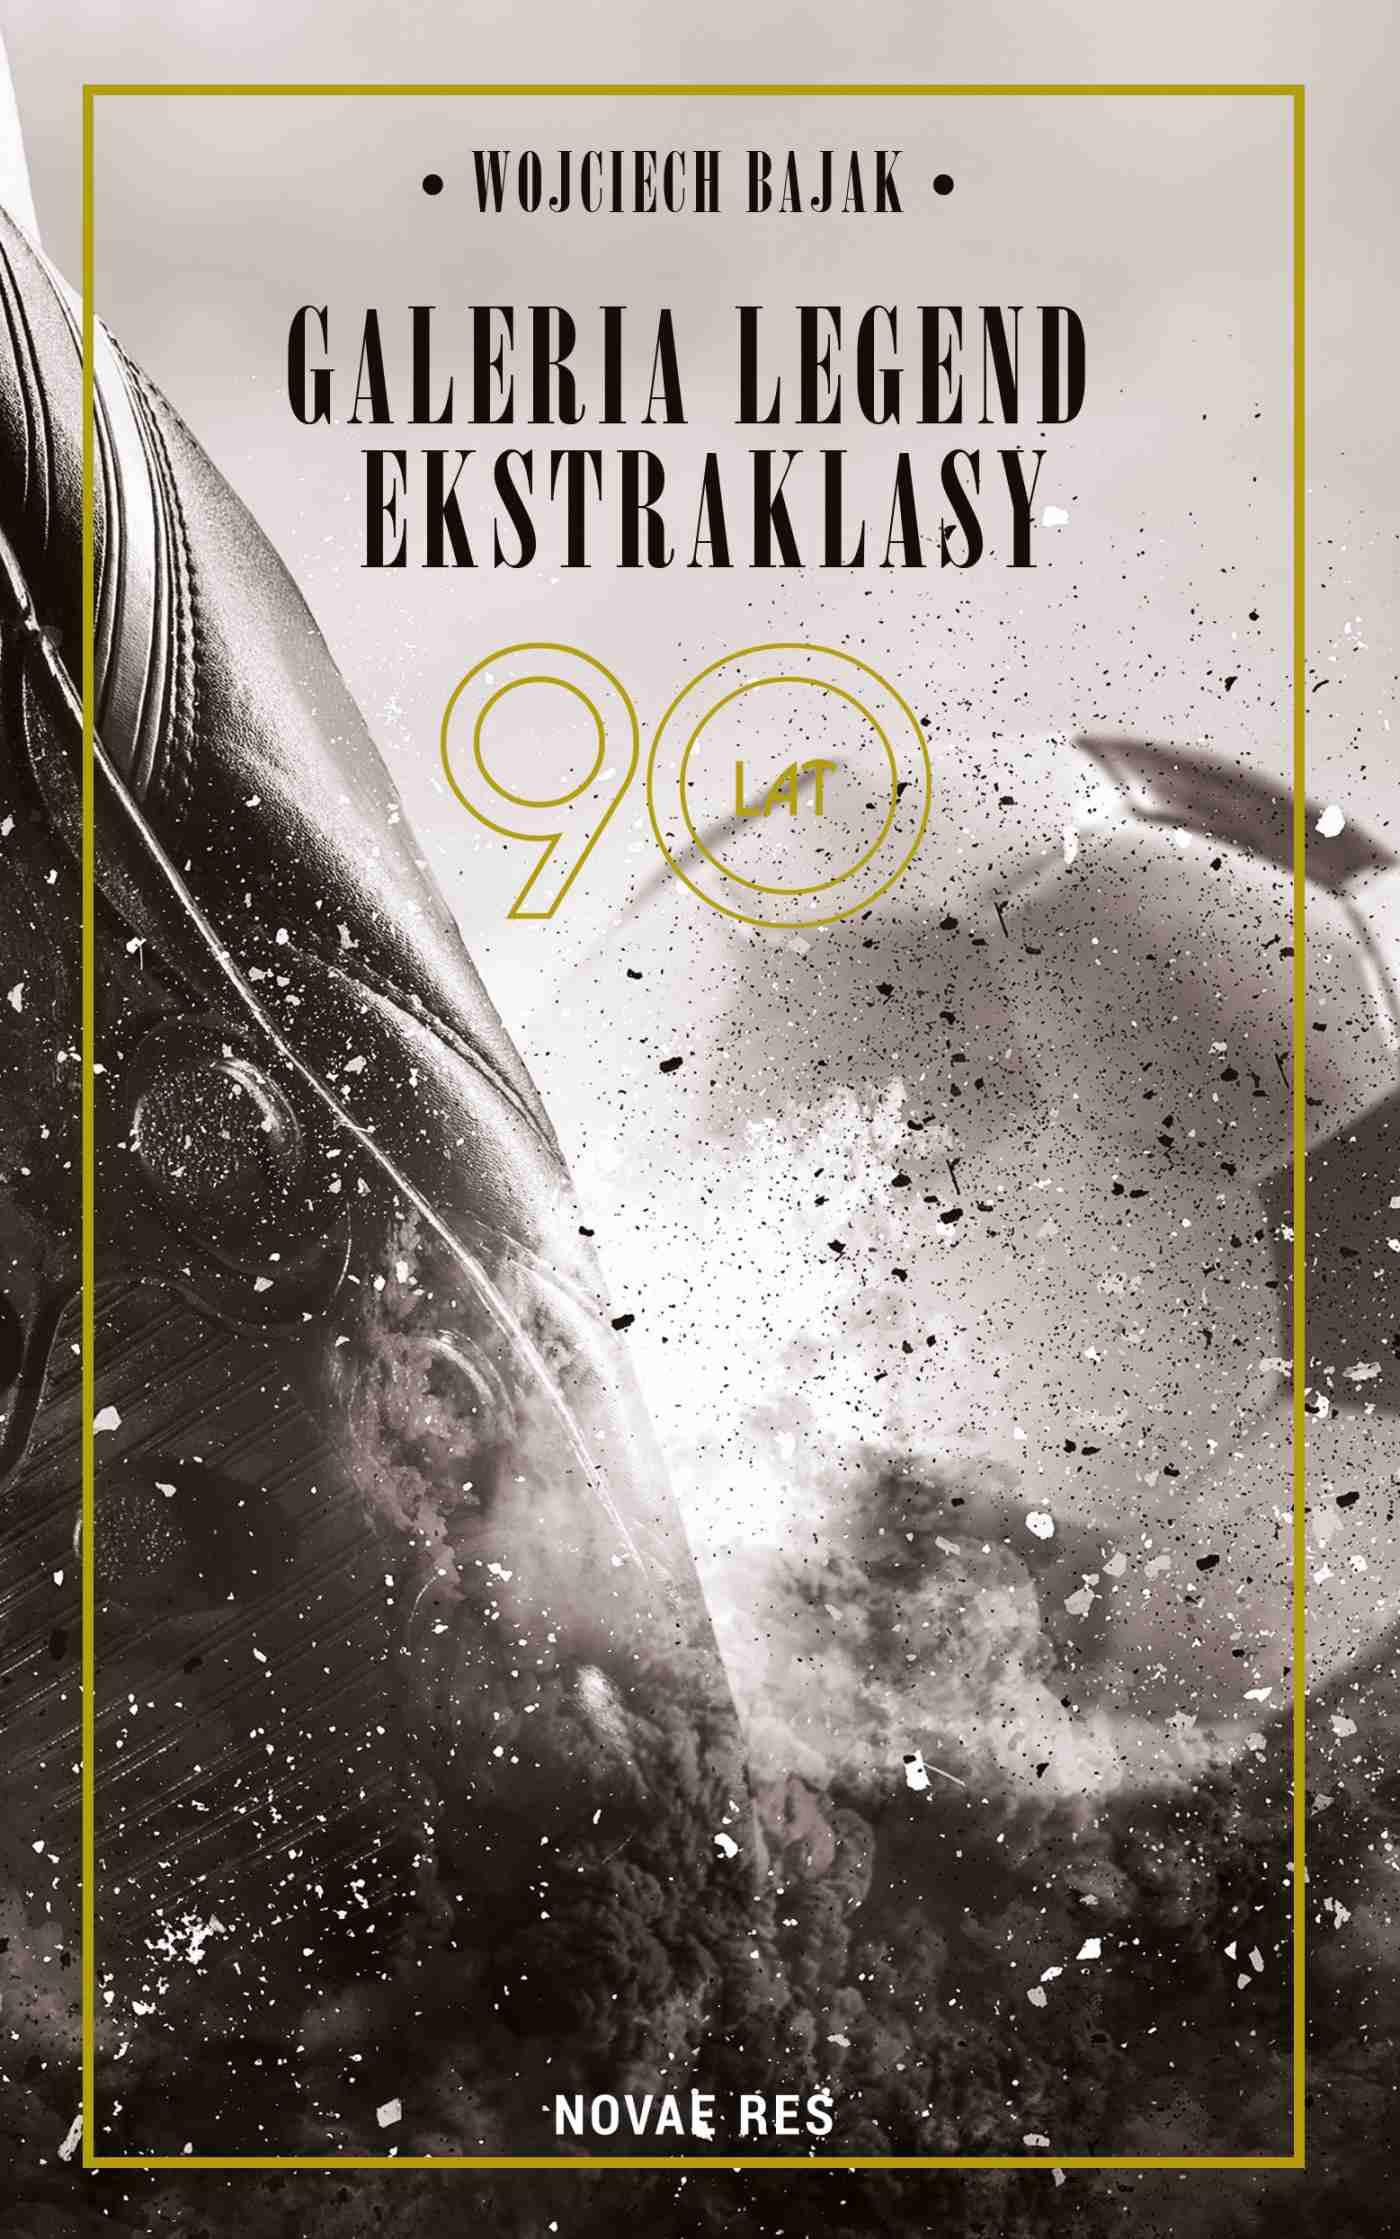 Galeria legend ekstraklasy - Ebook (Książka na Kindle) do pobrania w formacie MOBI